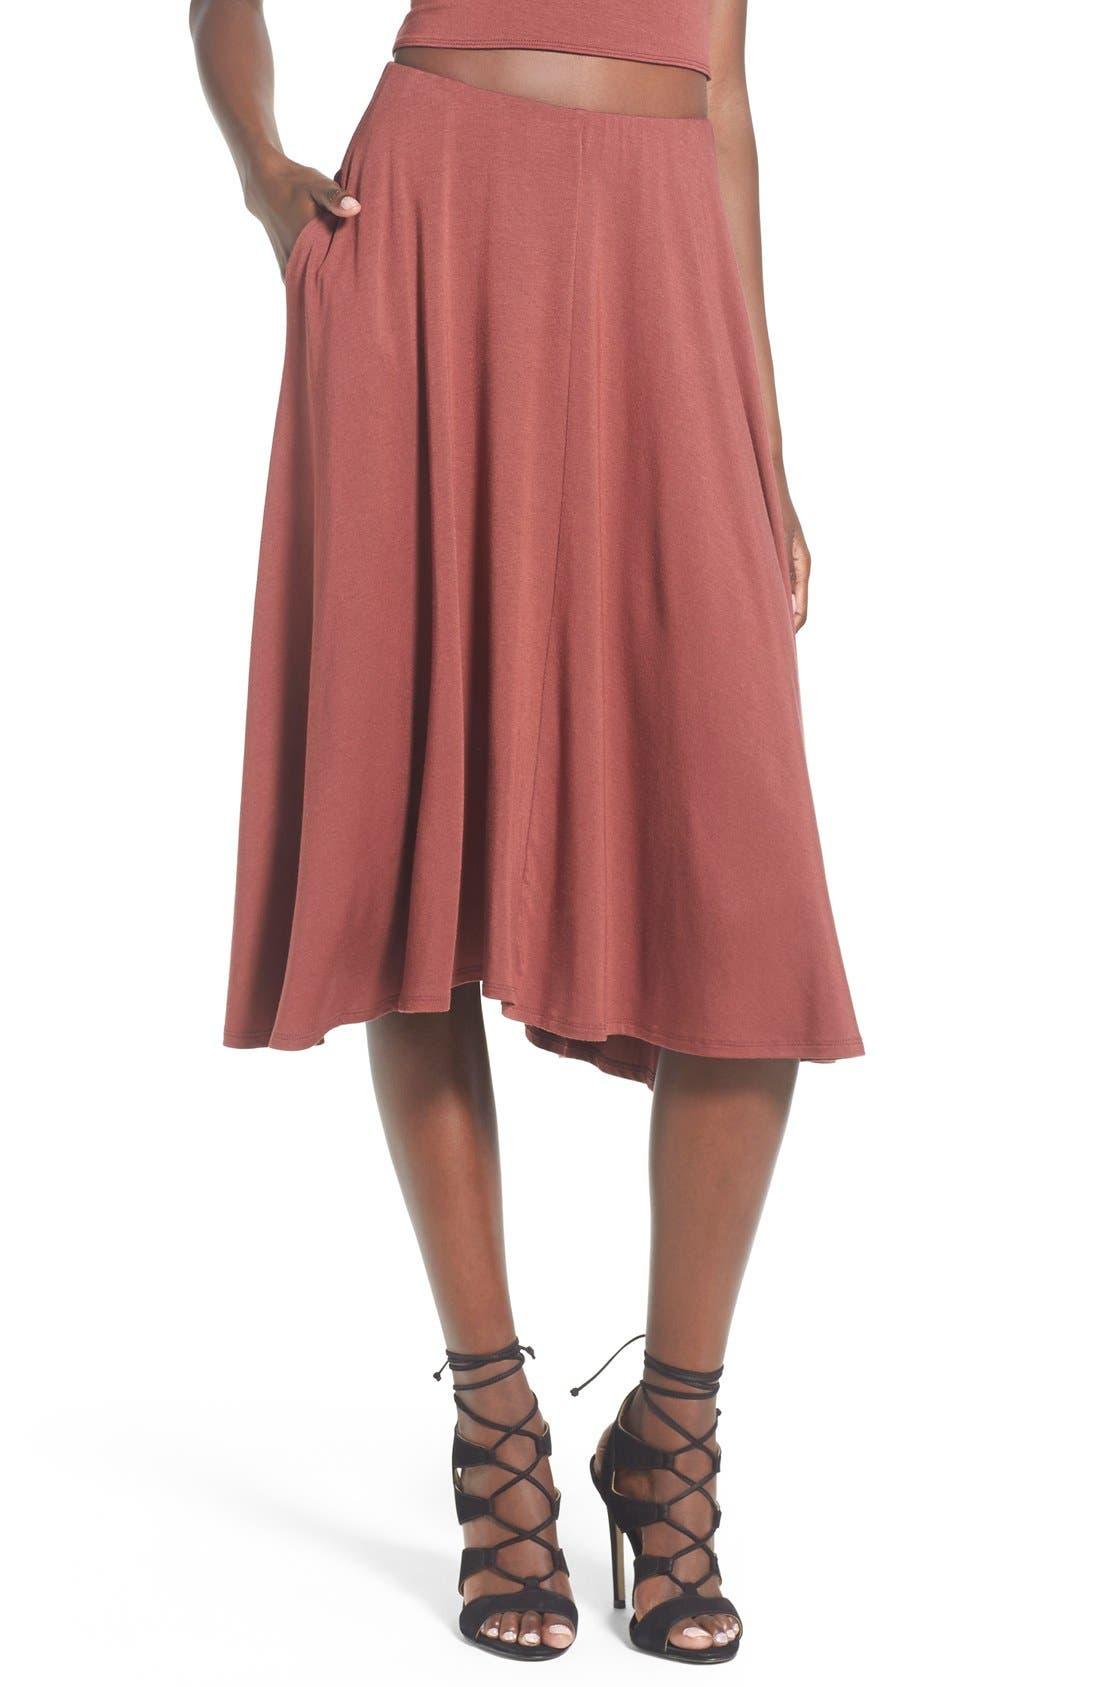 Alternate Image 1 Selected - Leith Circle Midi Skirt